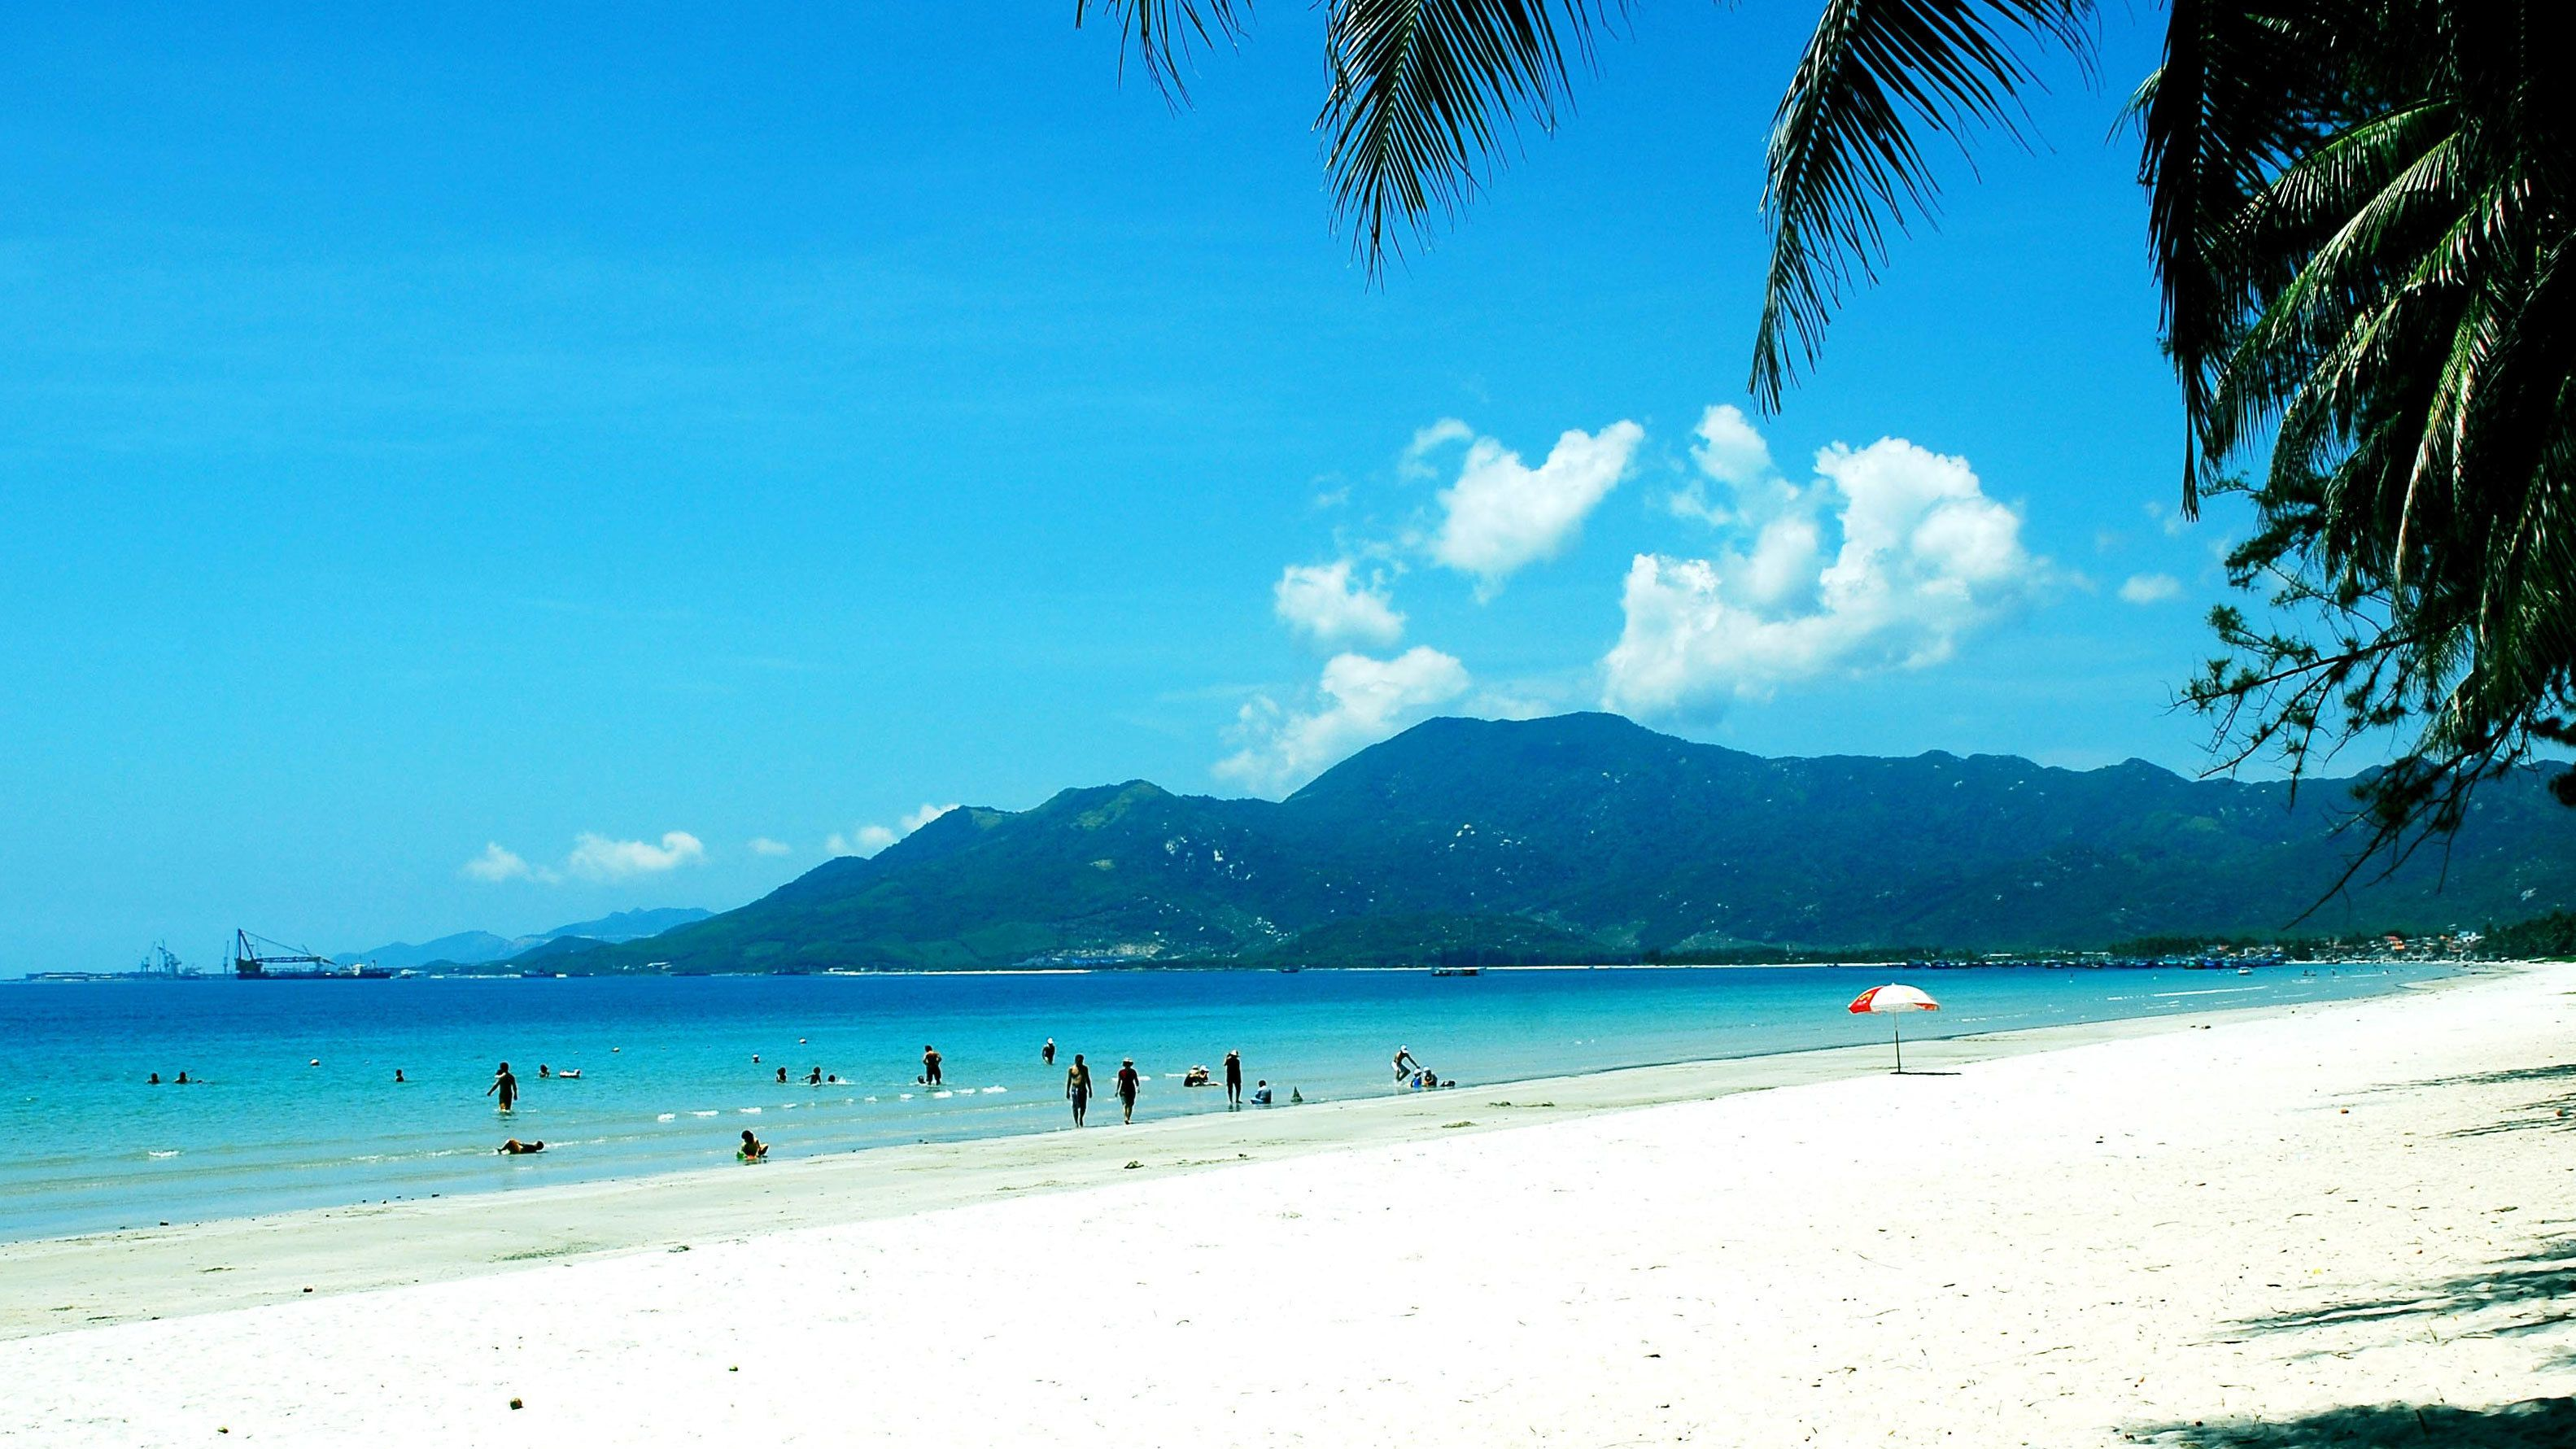 Excursion to Cu Lao Cham Marine Park